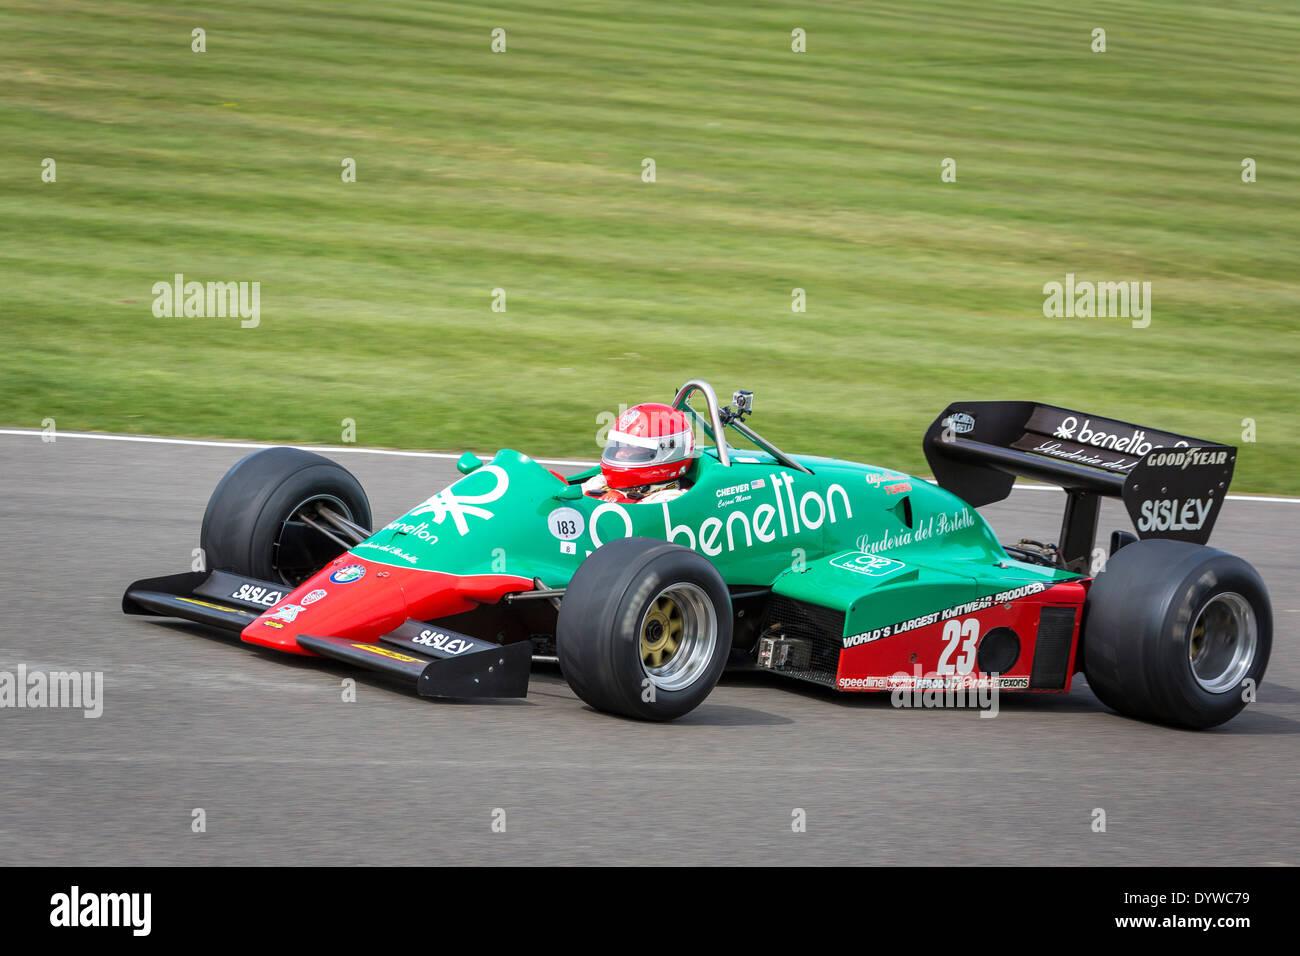 1983 Alfa Romeo Benetton 183T mit Fahrer Marco Cajani an der 72. Goodwood Mitgliederversammlung, Sussex, UK. Stockbild